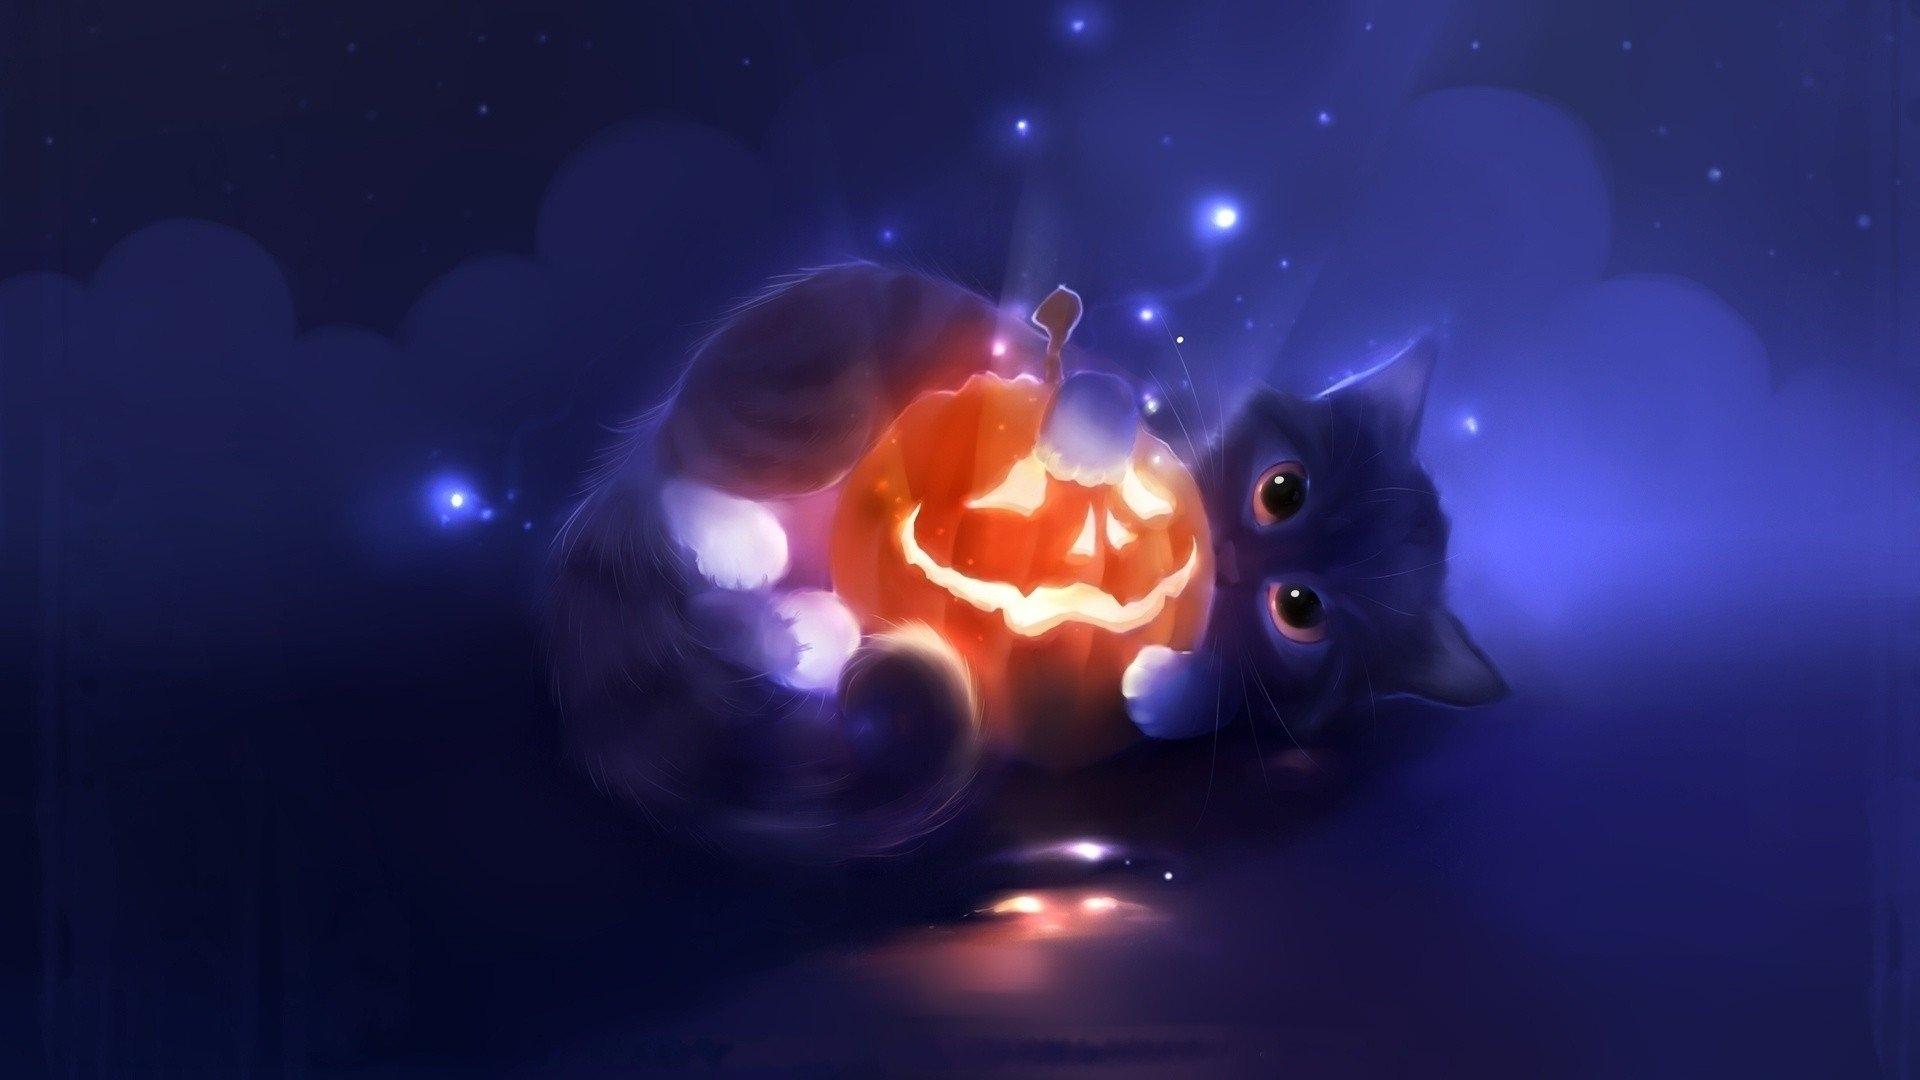 Halloween Background Hd.10 New Cute Halloween Hd Wallpaper Full Hd 1920 1080 For Pc